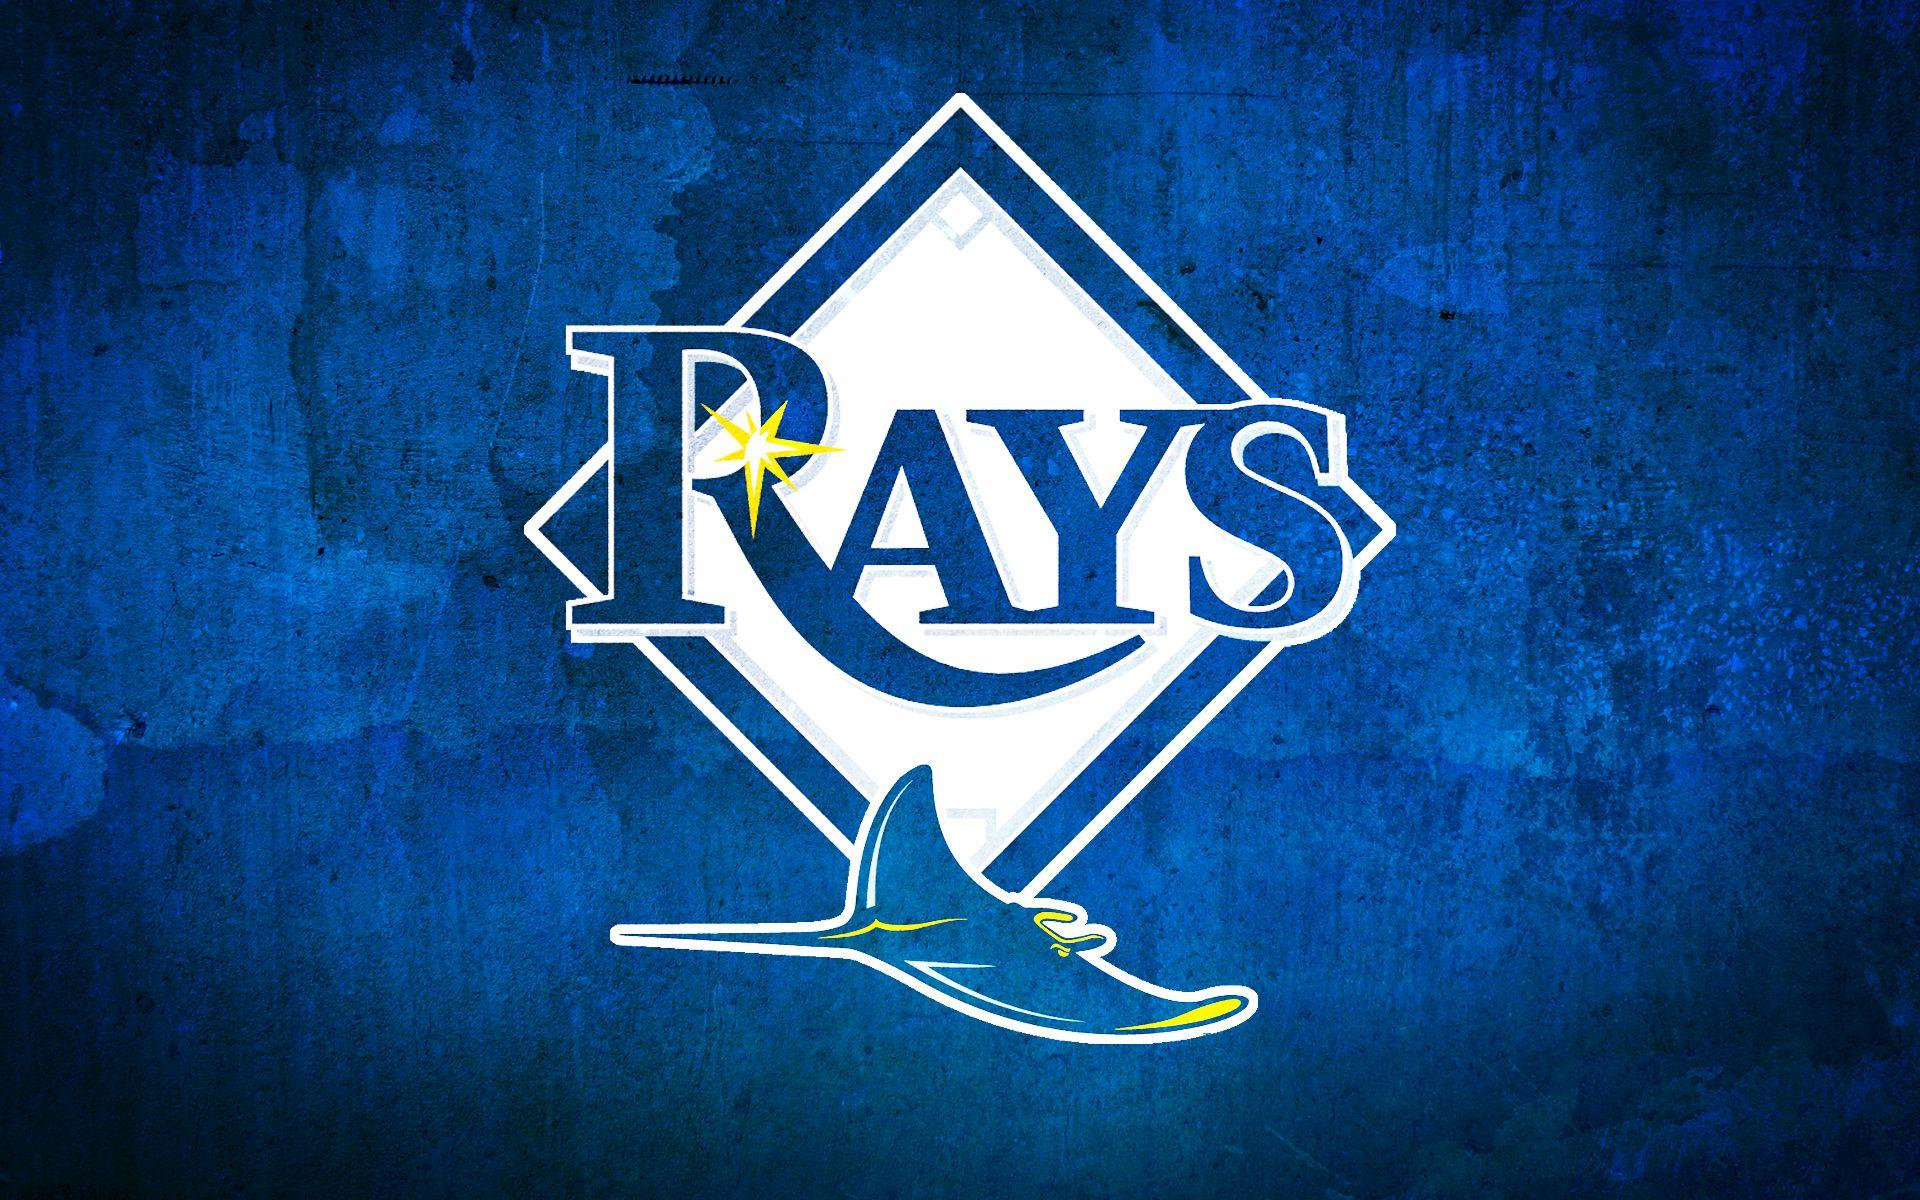 Tampa Bay Rays Wallpaper